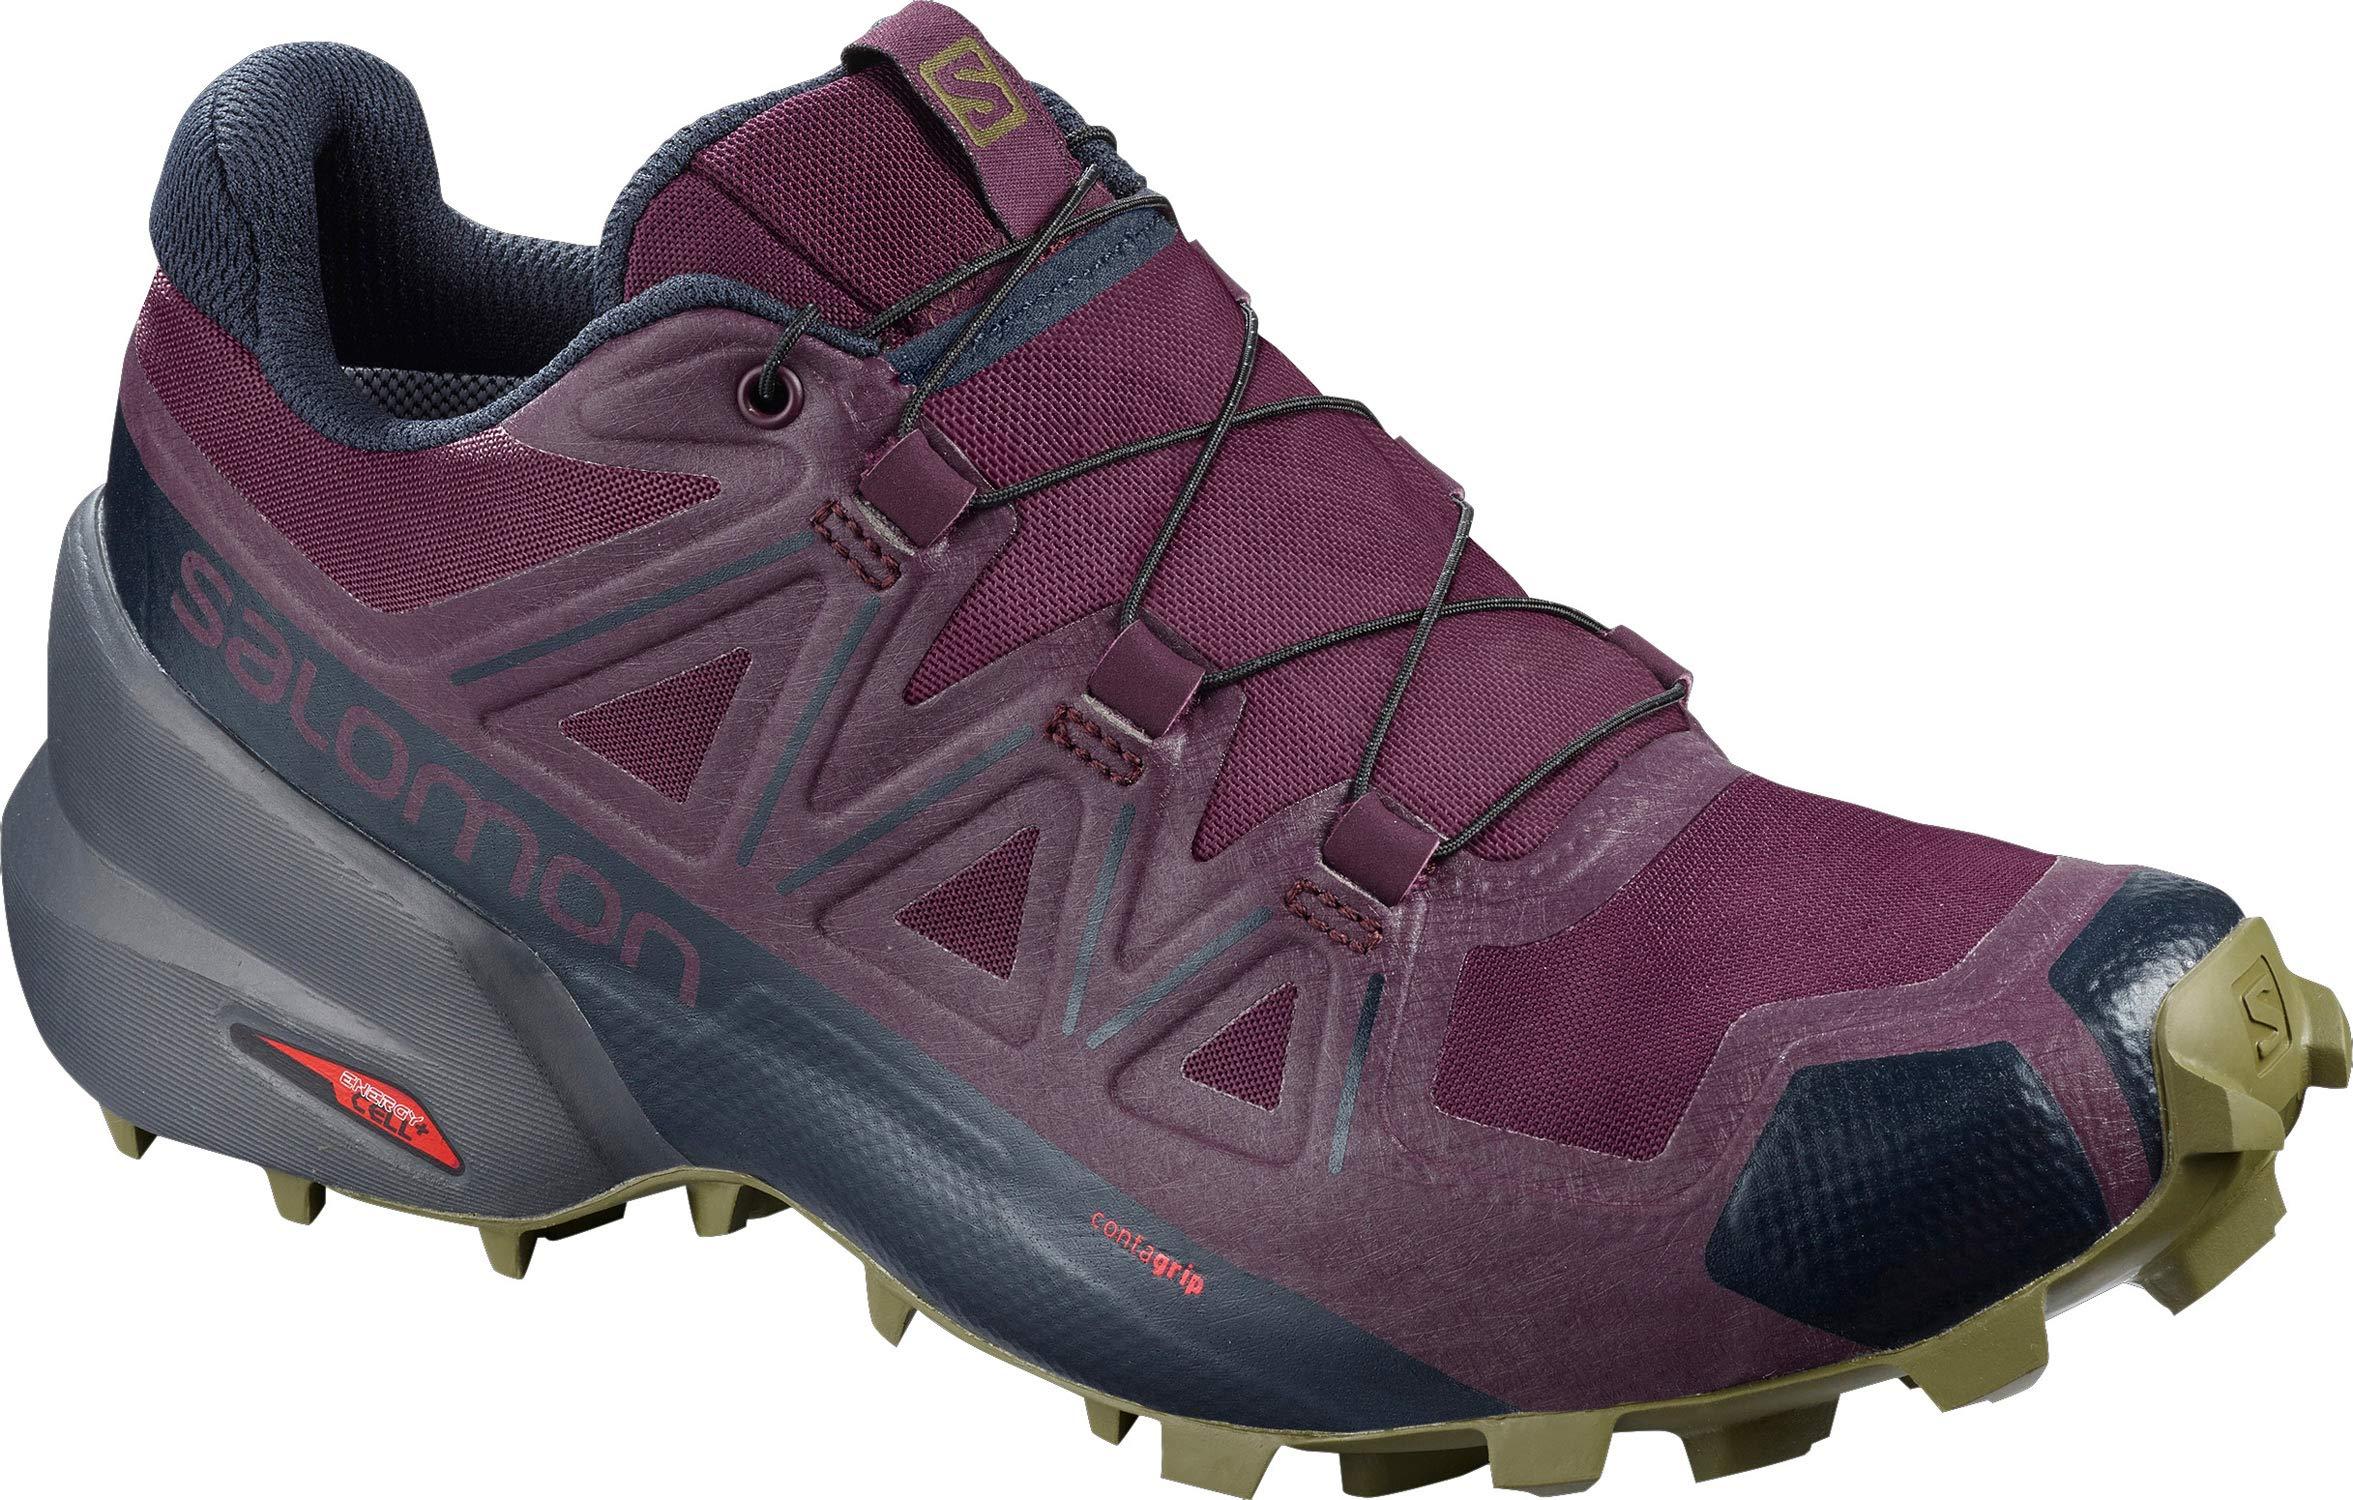 Salomon Women's Speedcross 5 Trail Running Shoes, Potent Purple/Ebony/Burnt Olive, 10 by SALOMON